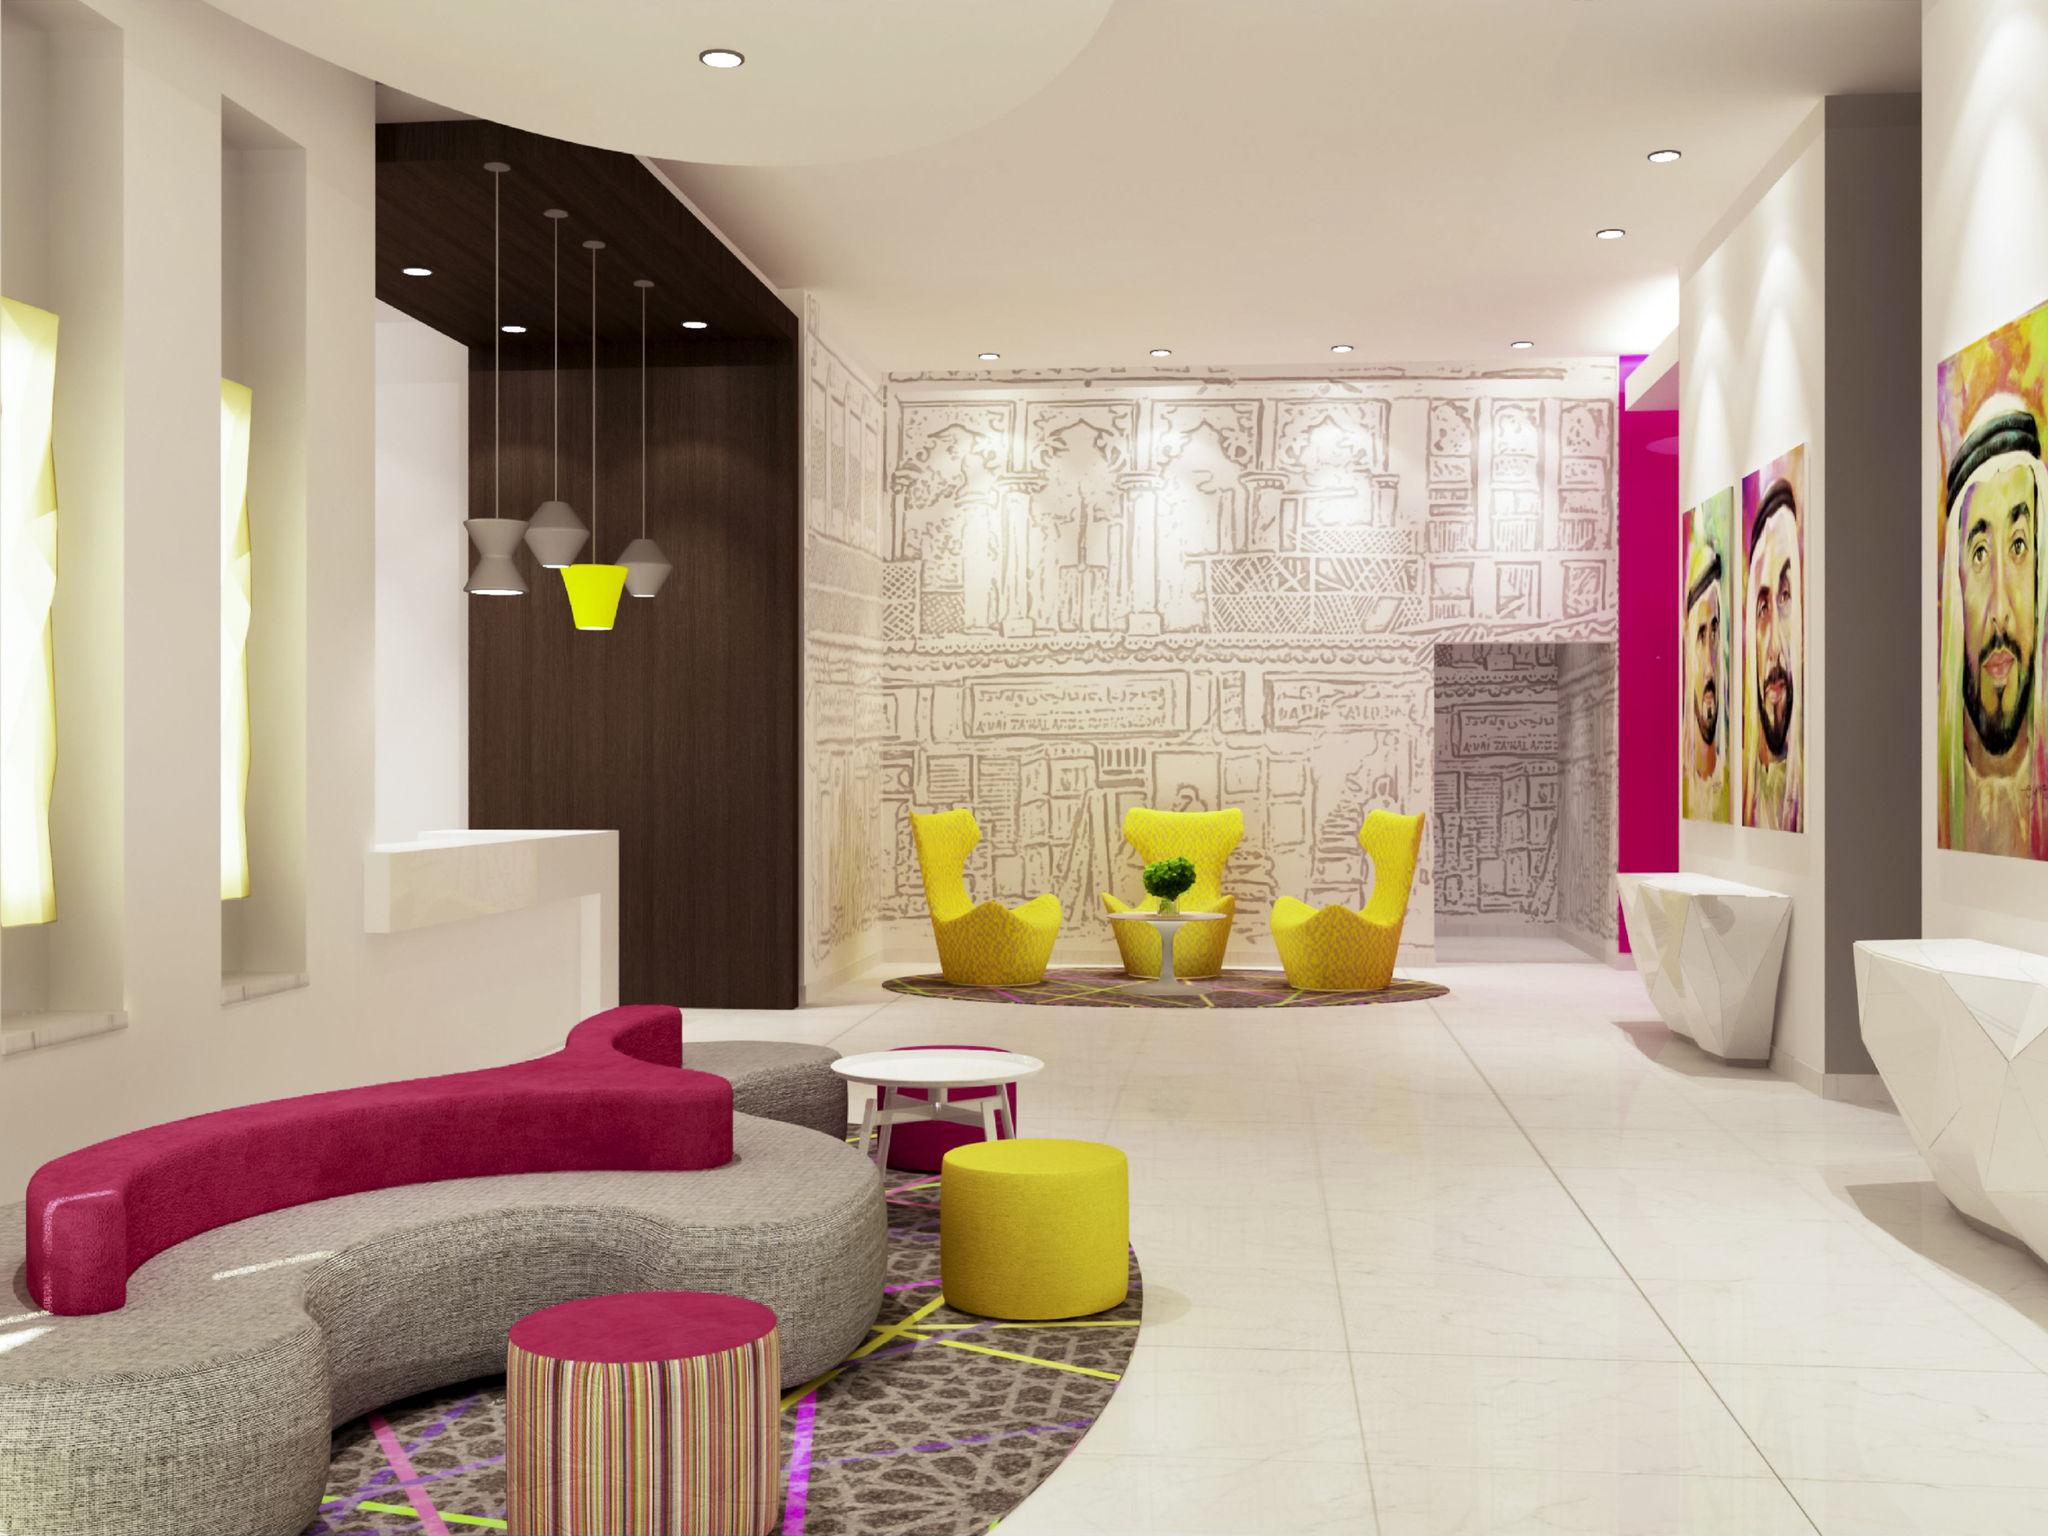 Hotel - Al Majaz Hotel Sharjah - By AccorHotels